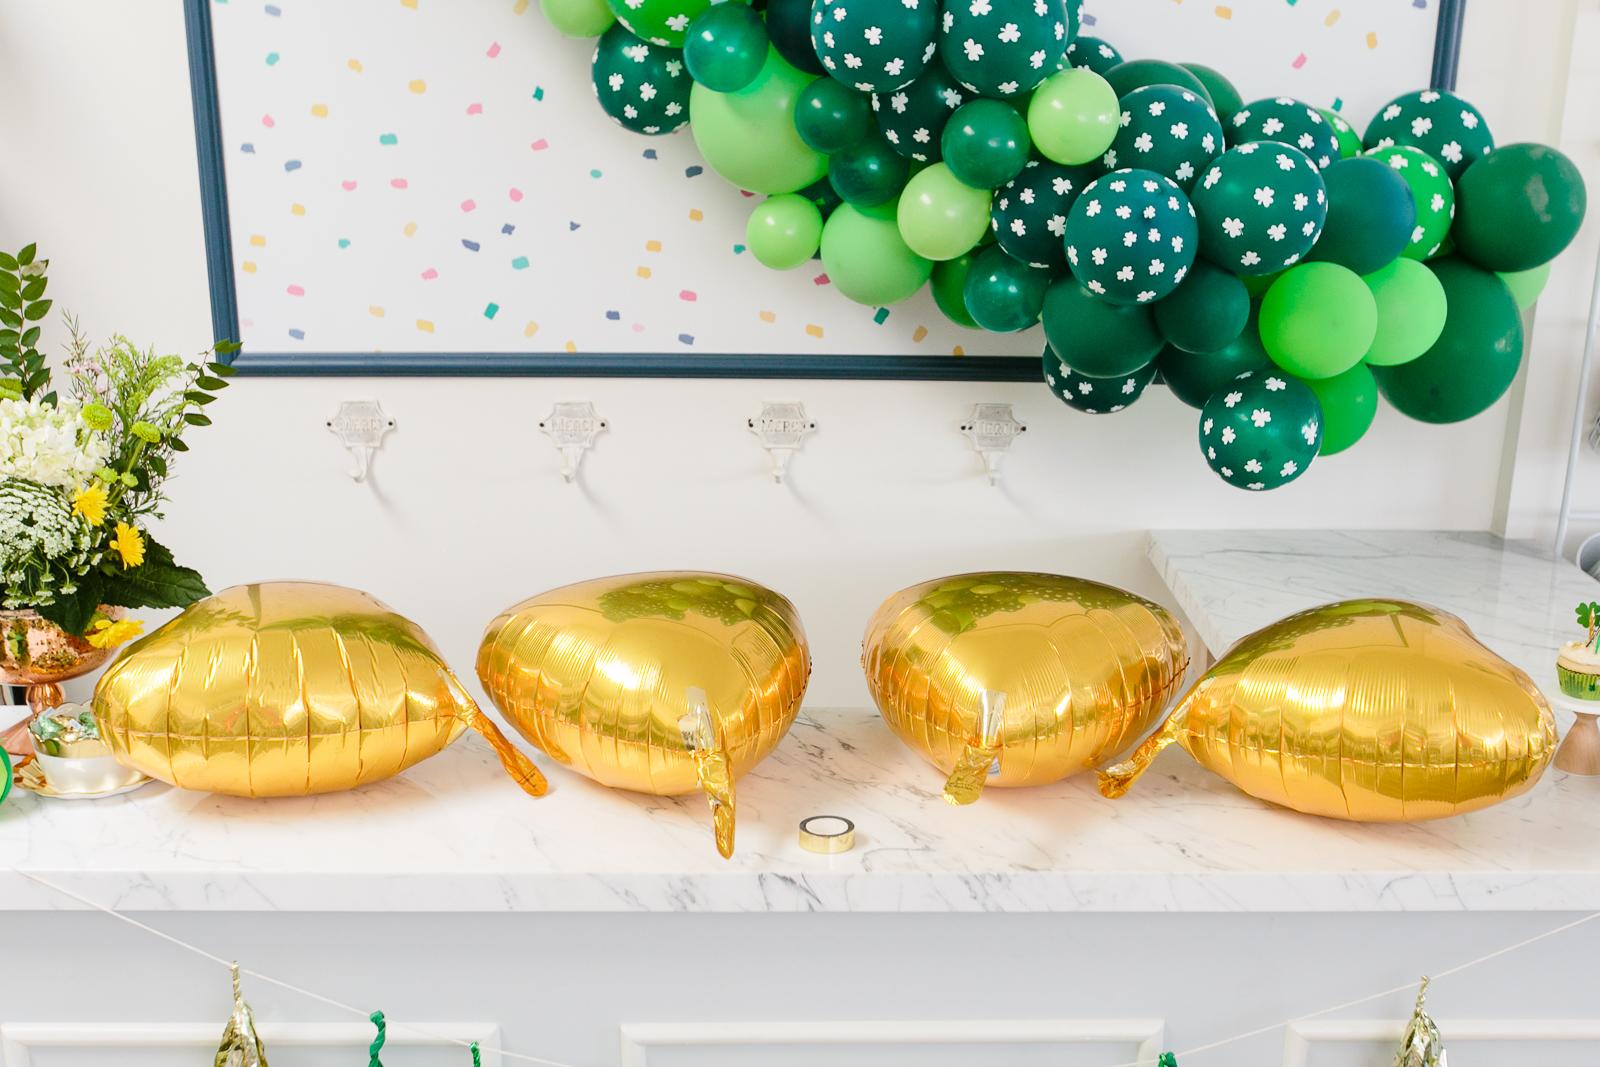 DIY Four-Leaf Clover Balloon Tutorial